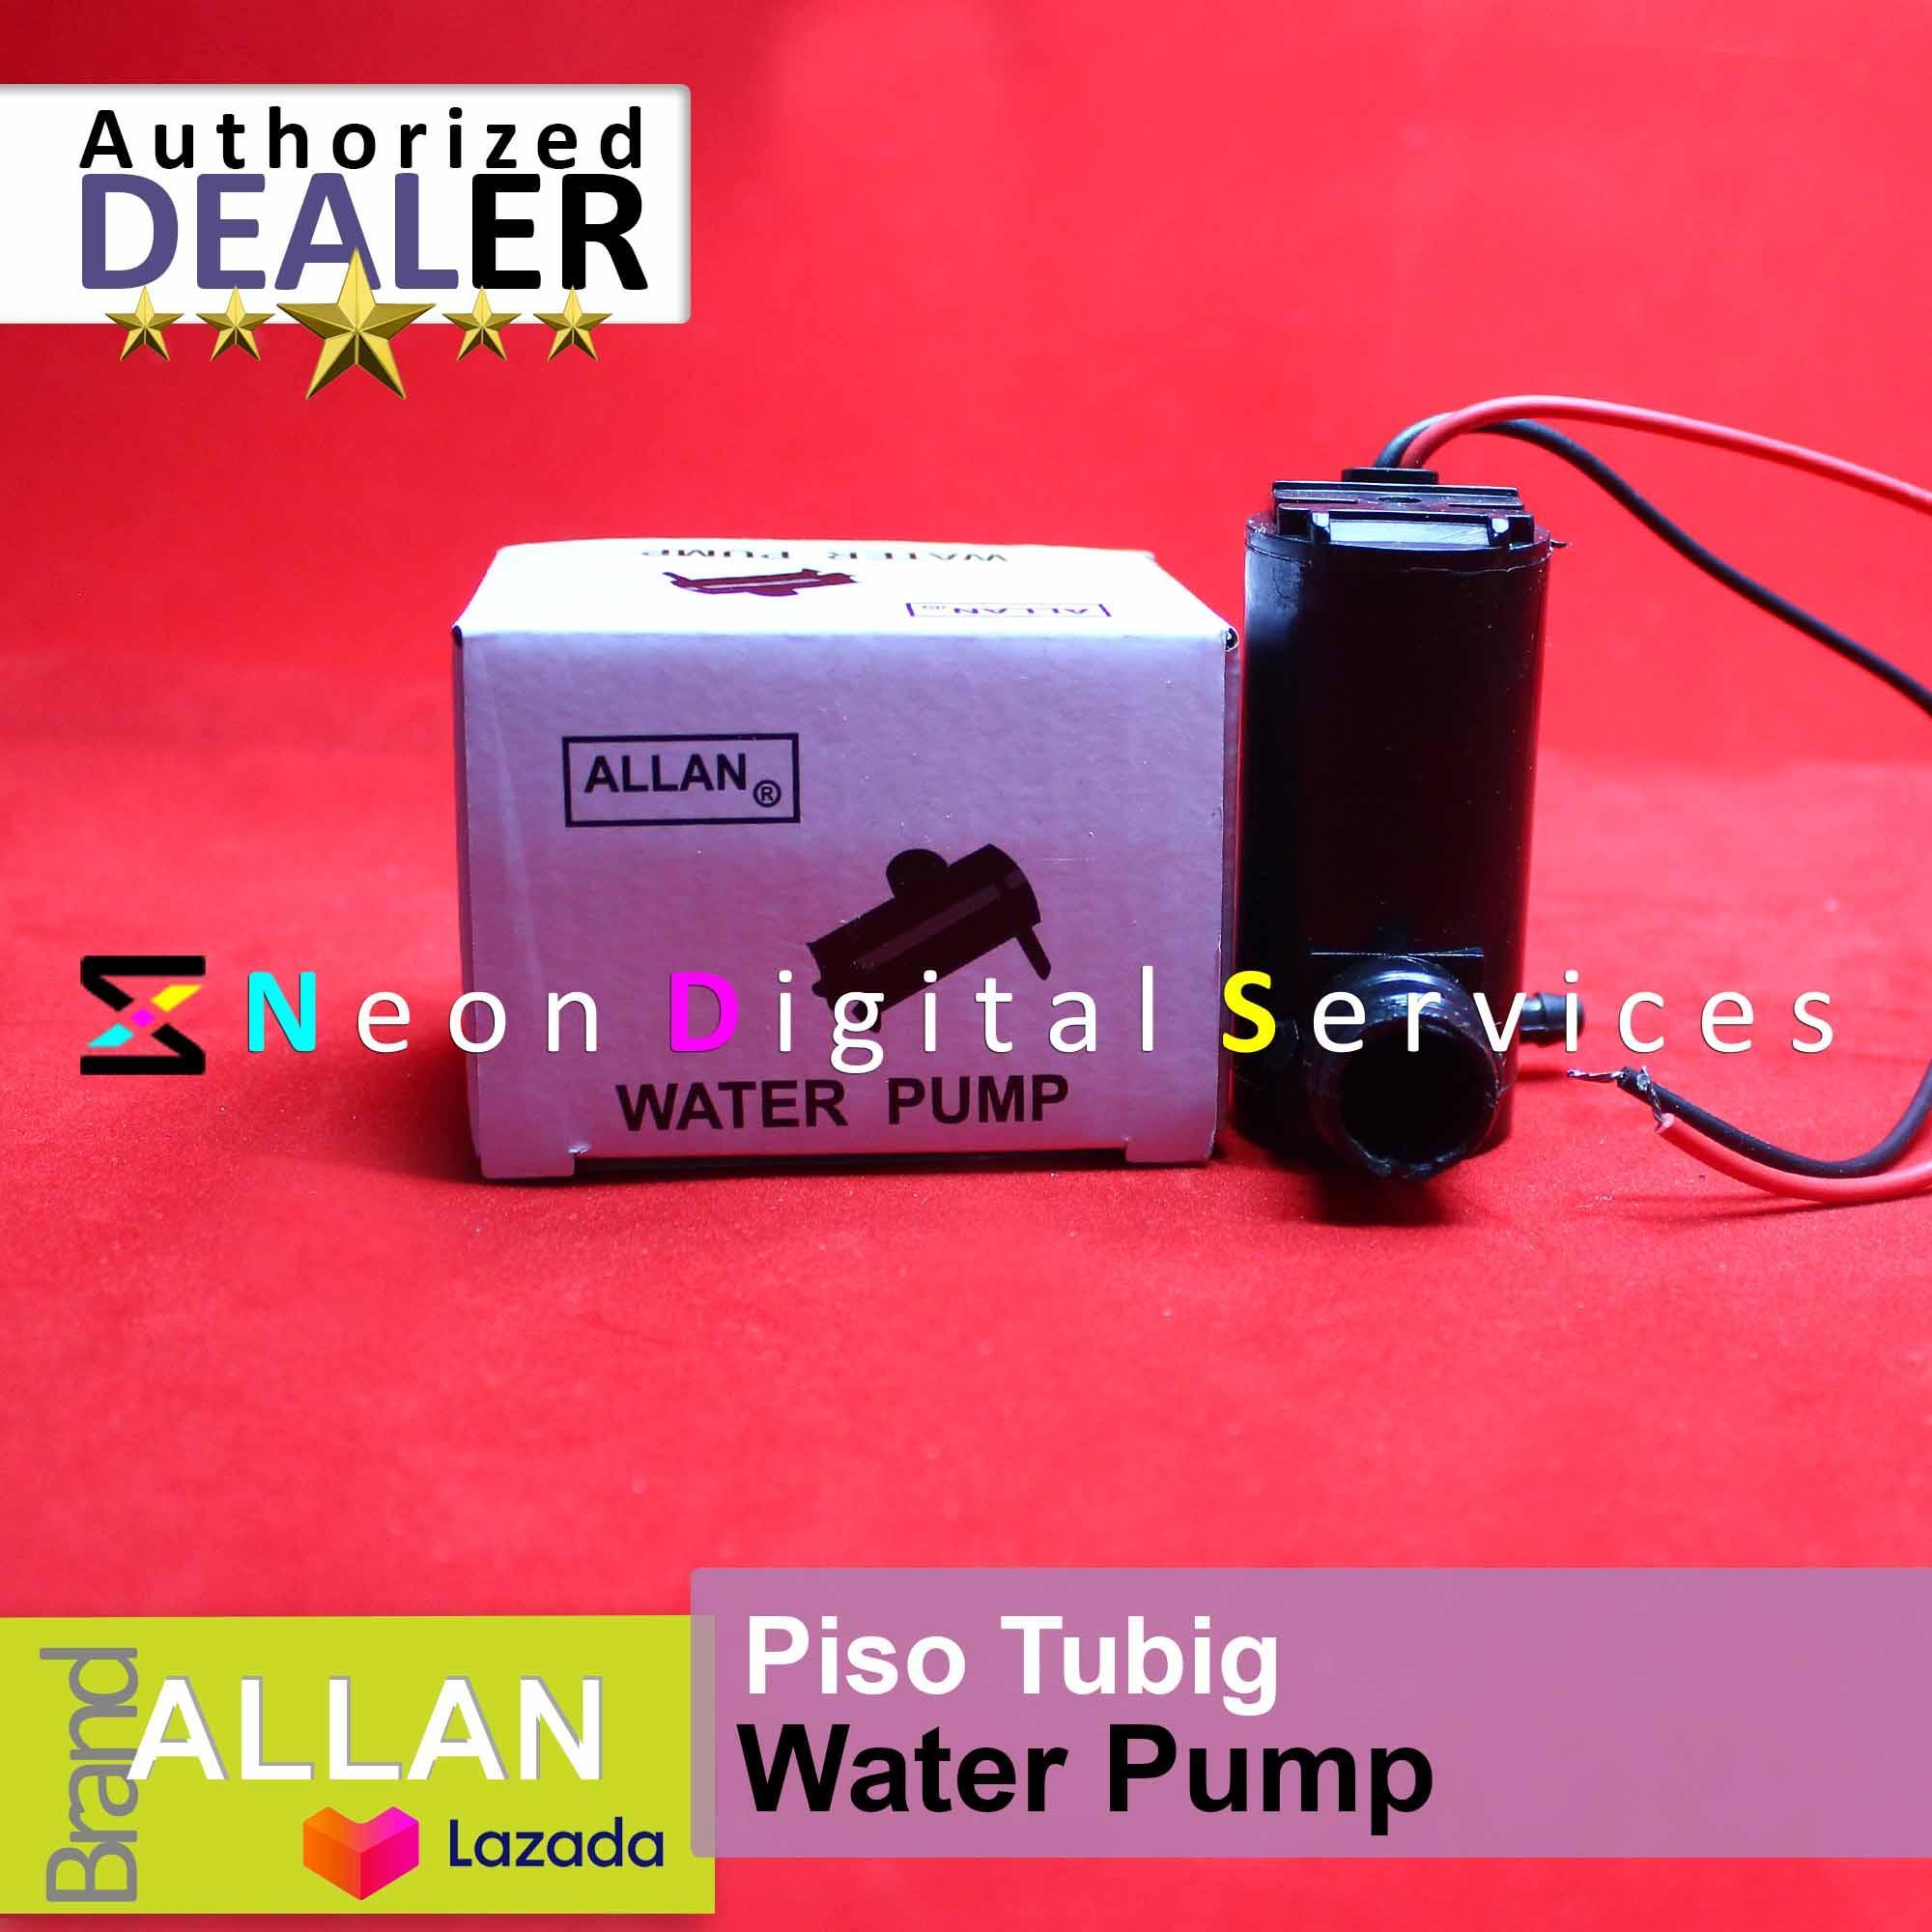 Water Pump for Water Vending Machine / Piso Tubig / Vendo Machine / Pisonet  / PisoWifi / Piso Net / Piso Wifi